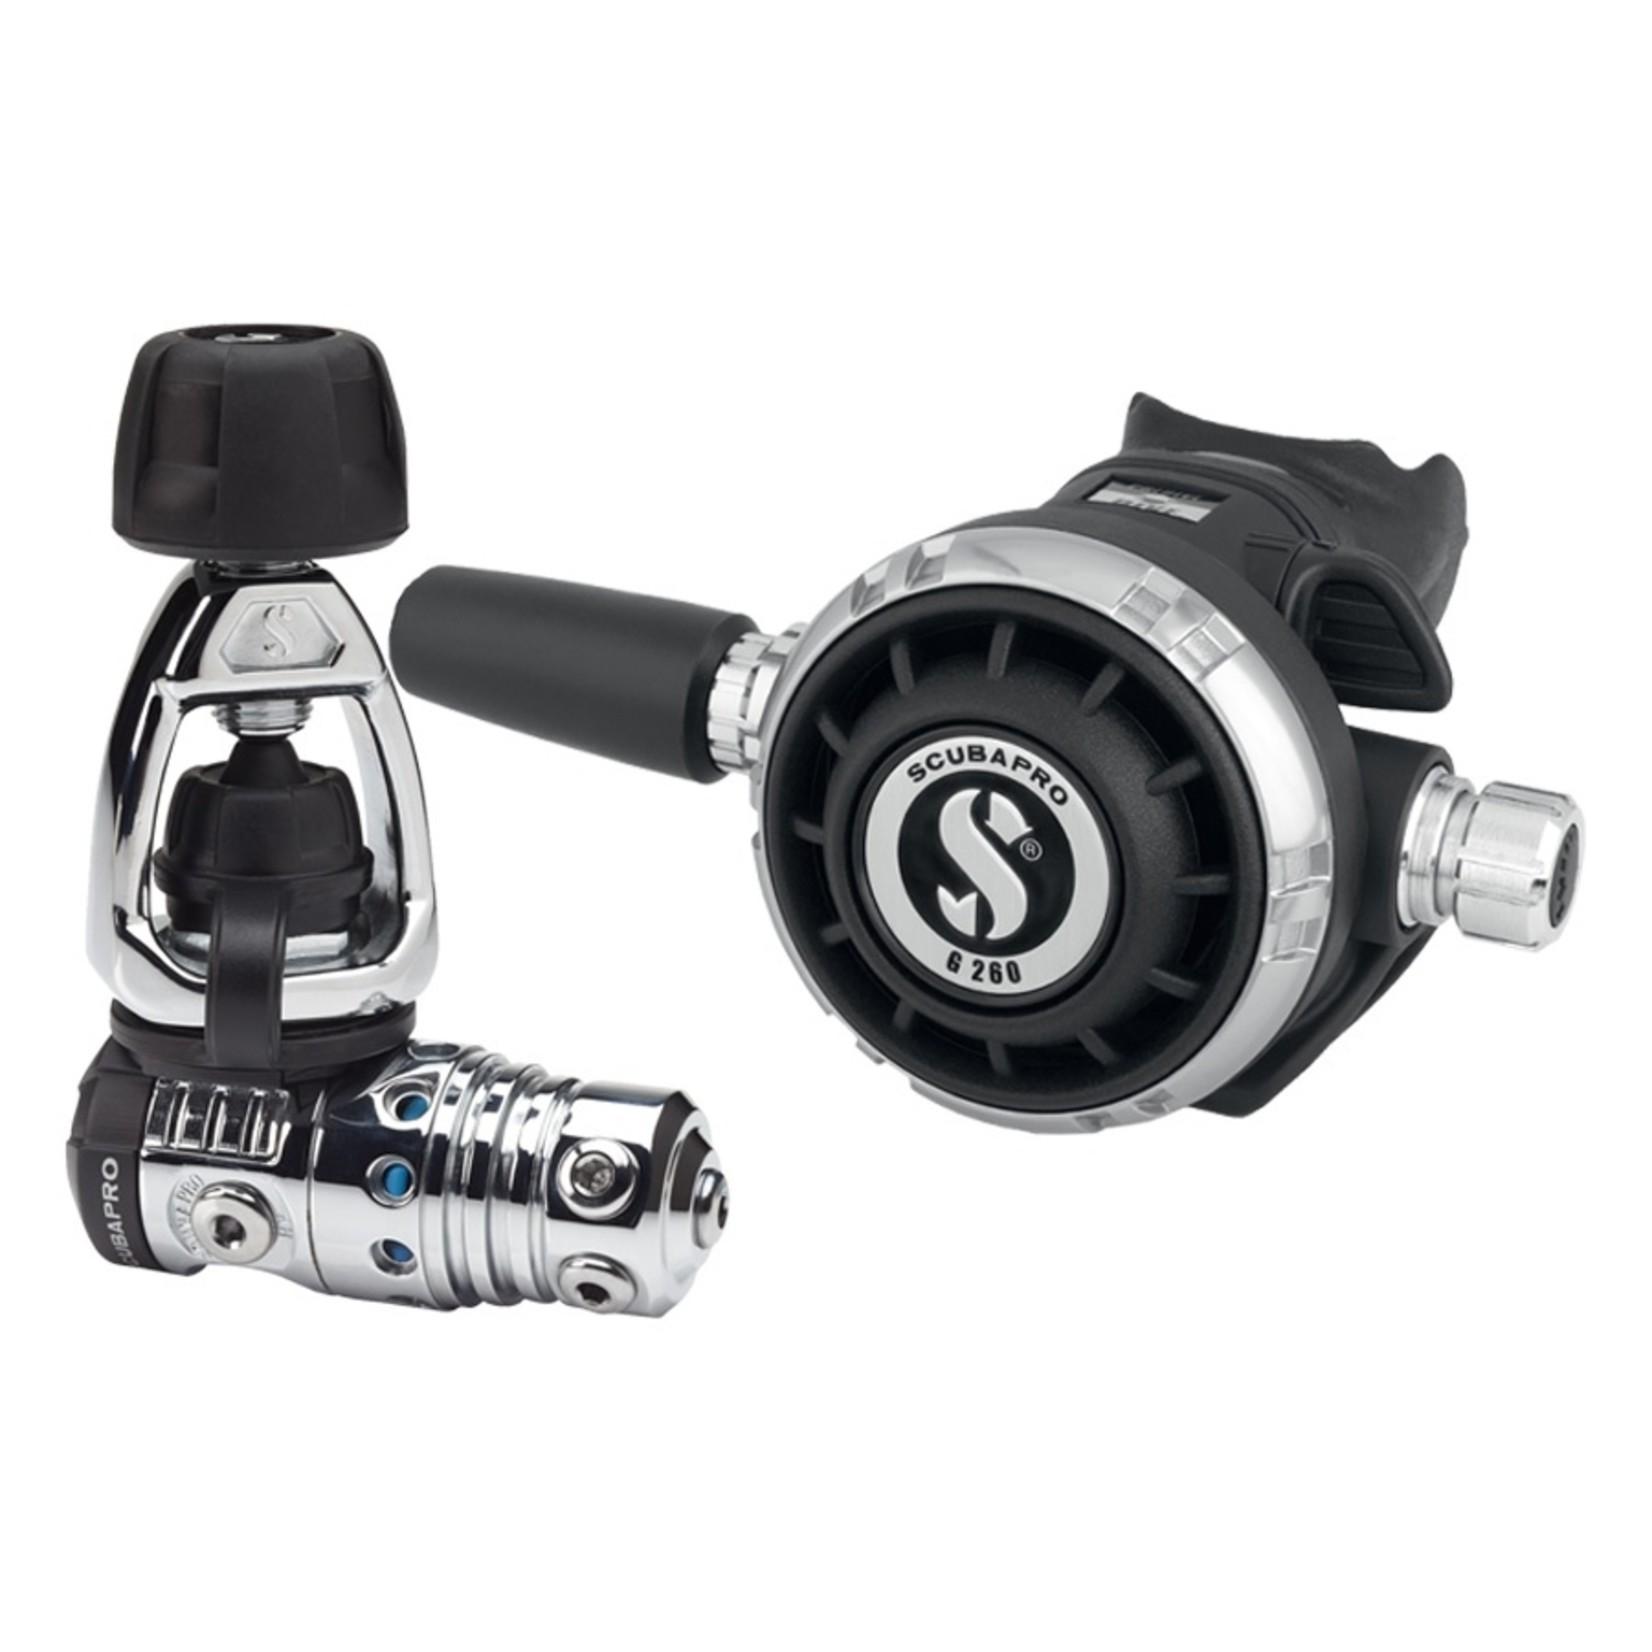 Scubapro MK25 / G260 set